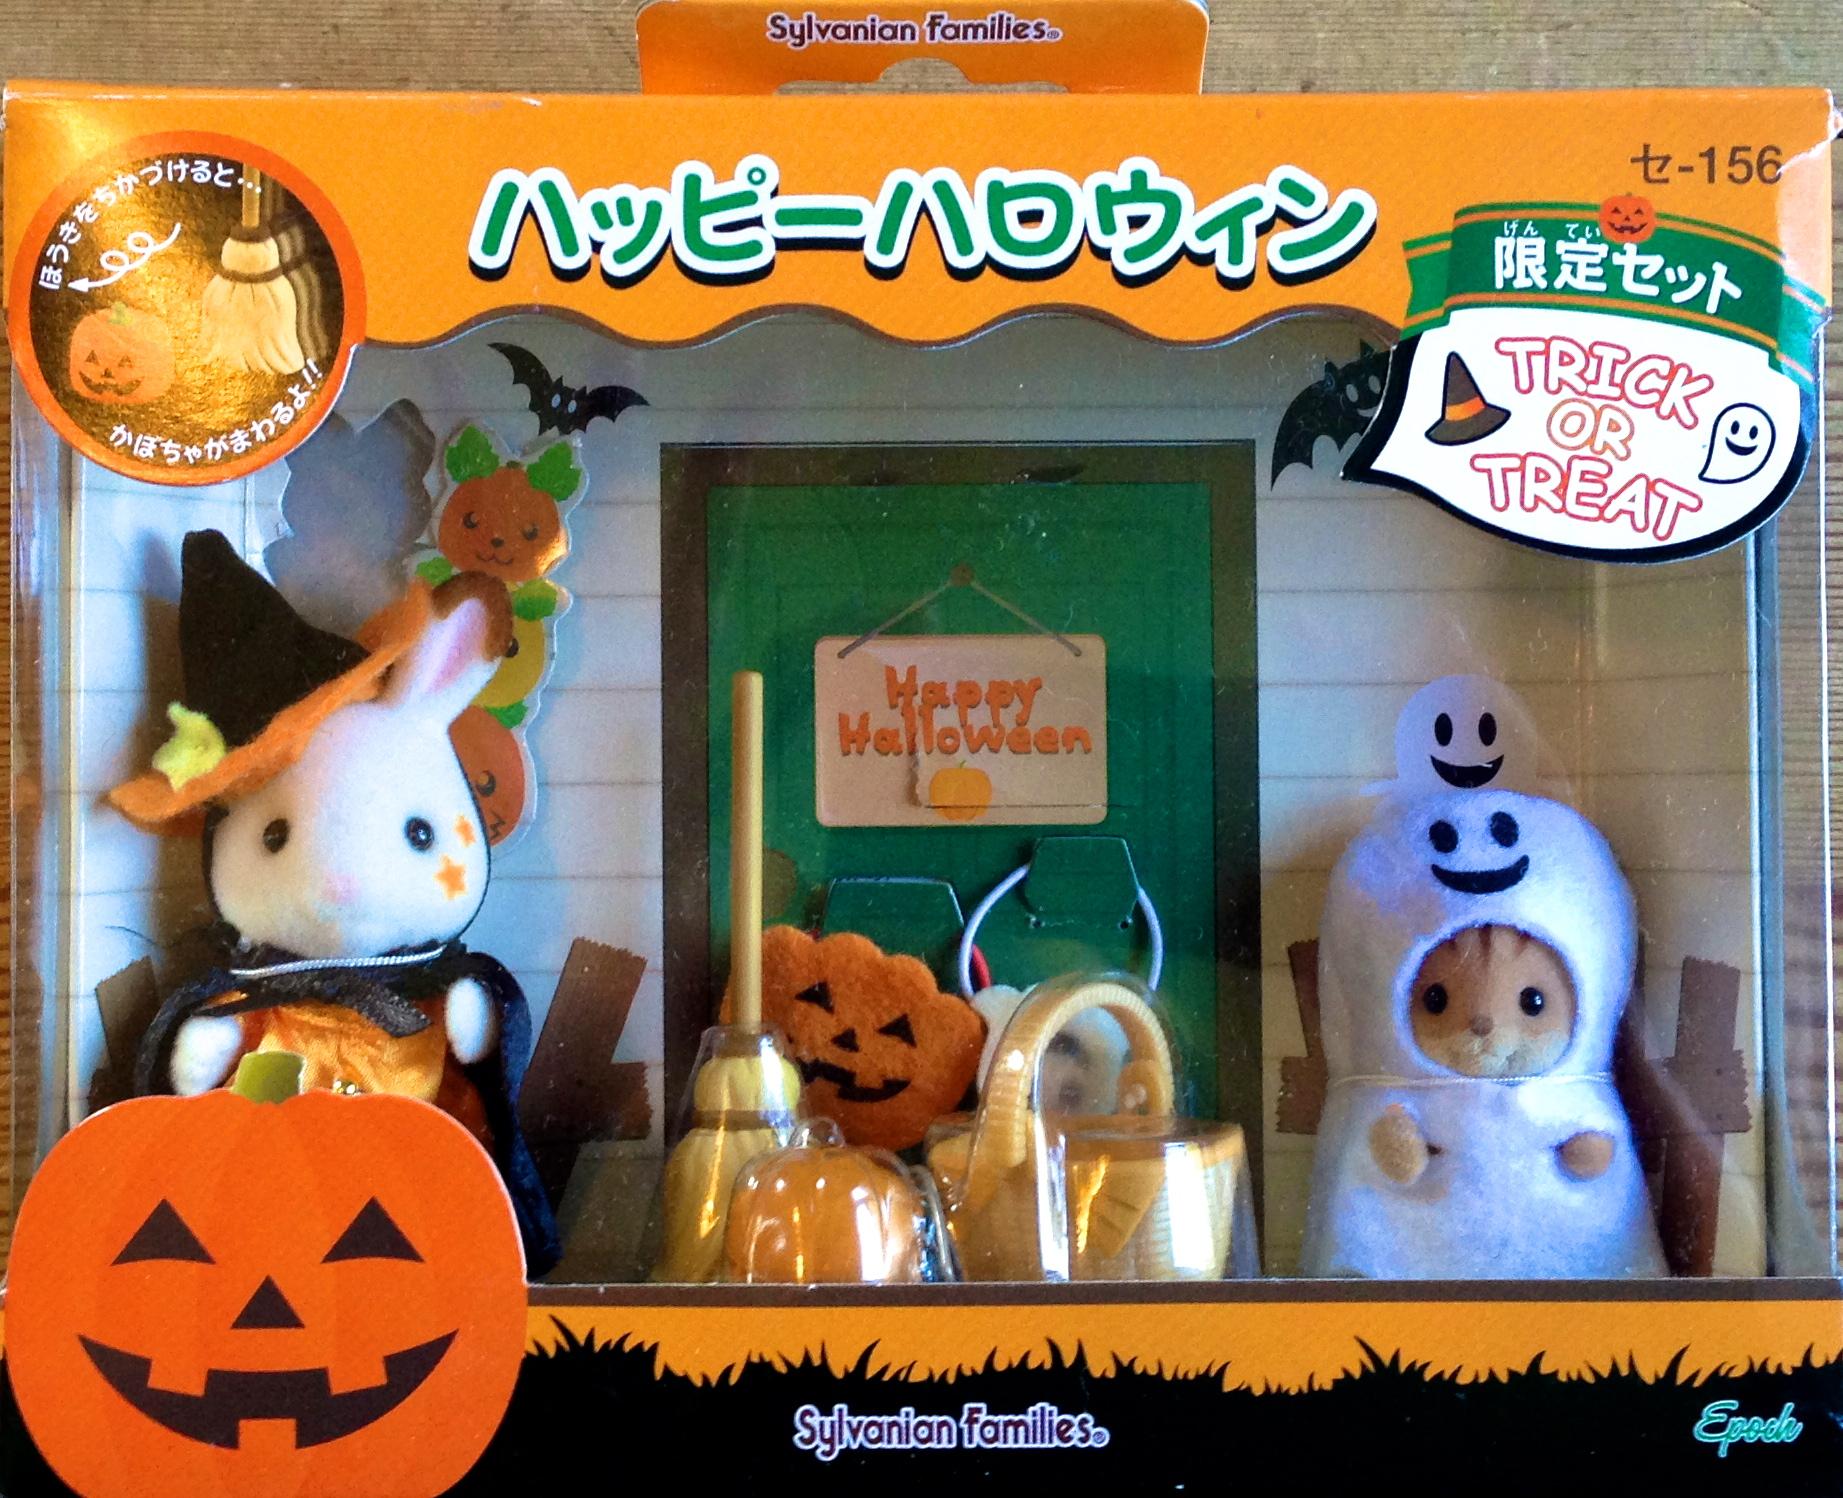 Teddy Bears  Friends  Sylvanian Families  JP Trick or Treat Halloween Costume Set  Chocolate